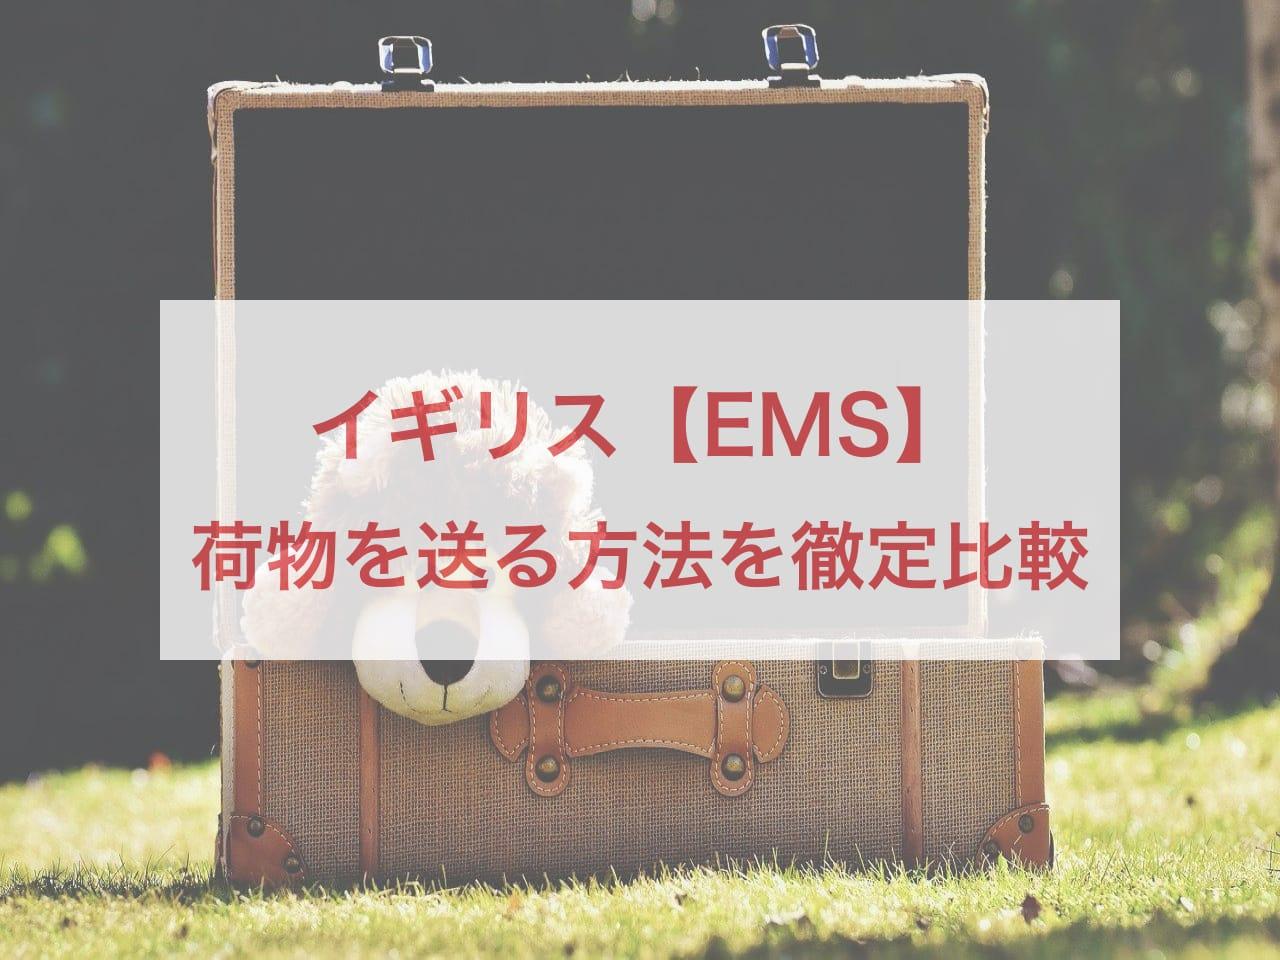 2020_05 minimal traveler, eyecatch, ems